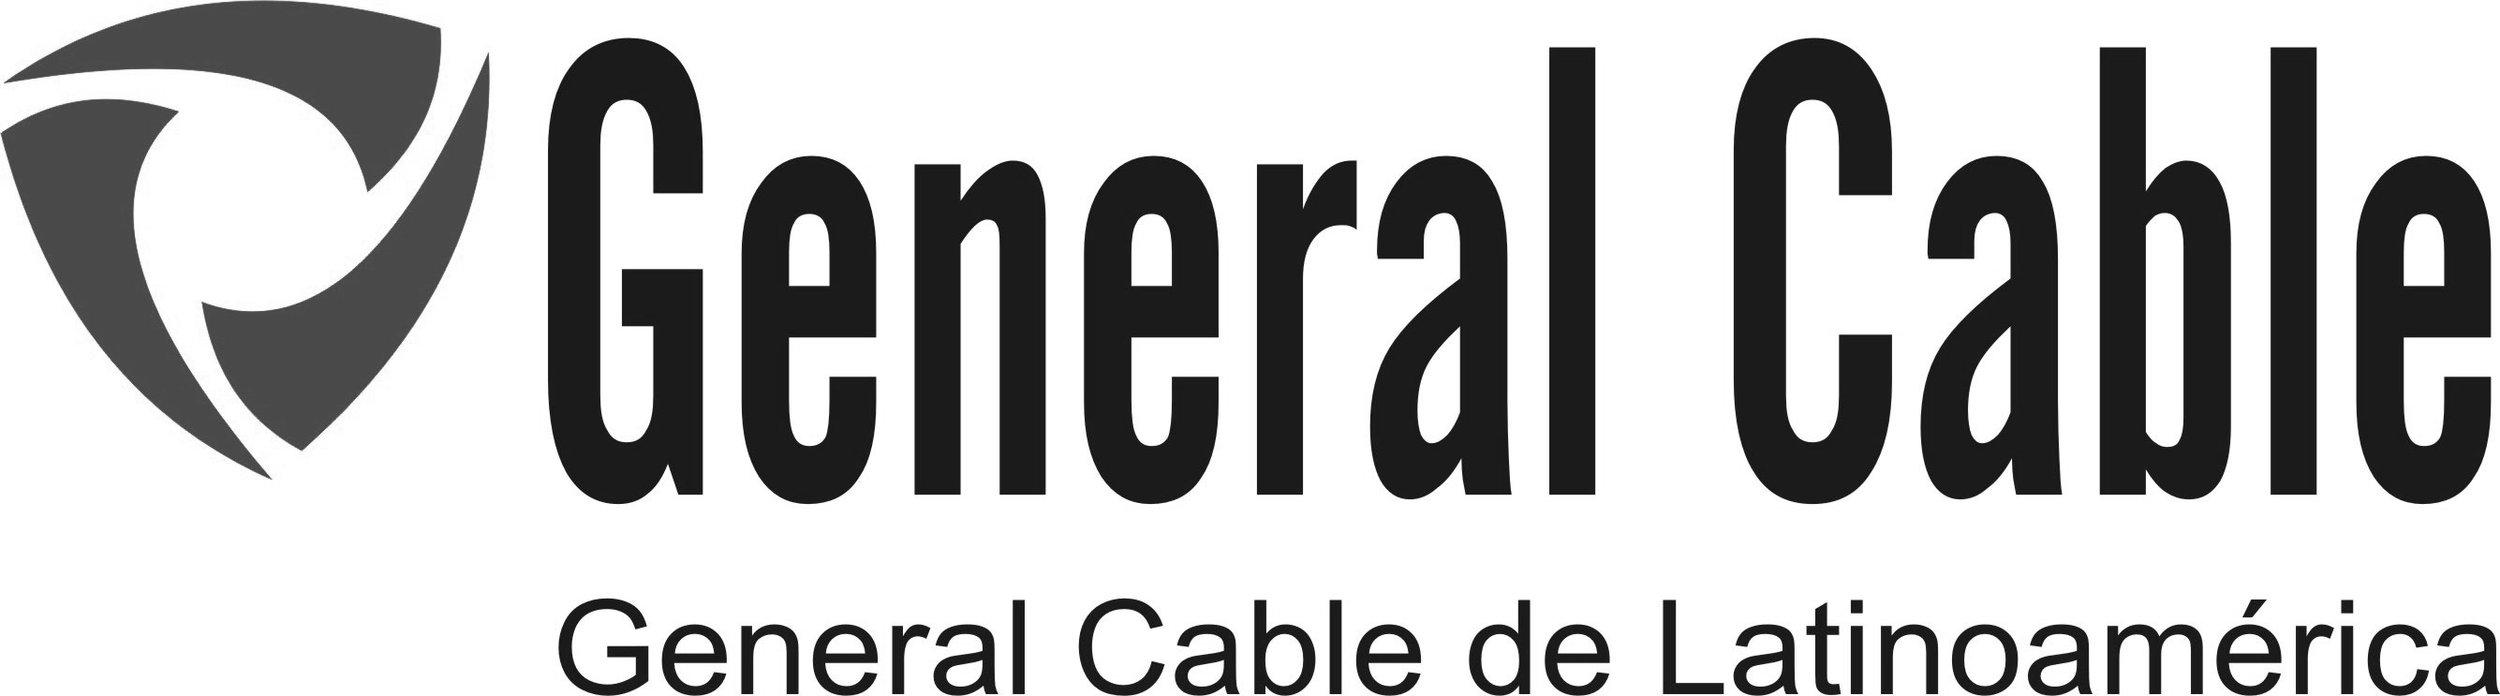 General-Cable-Desaturated.jpg